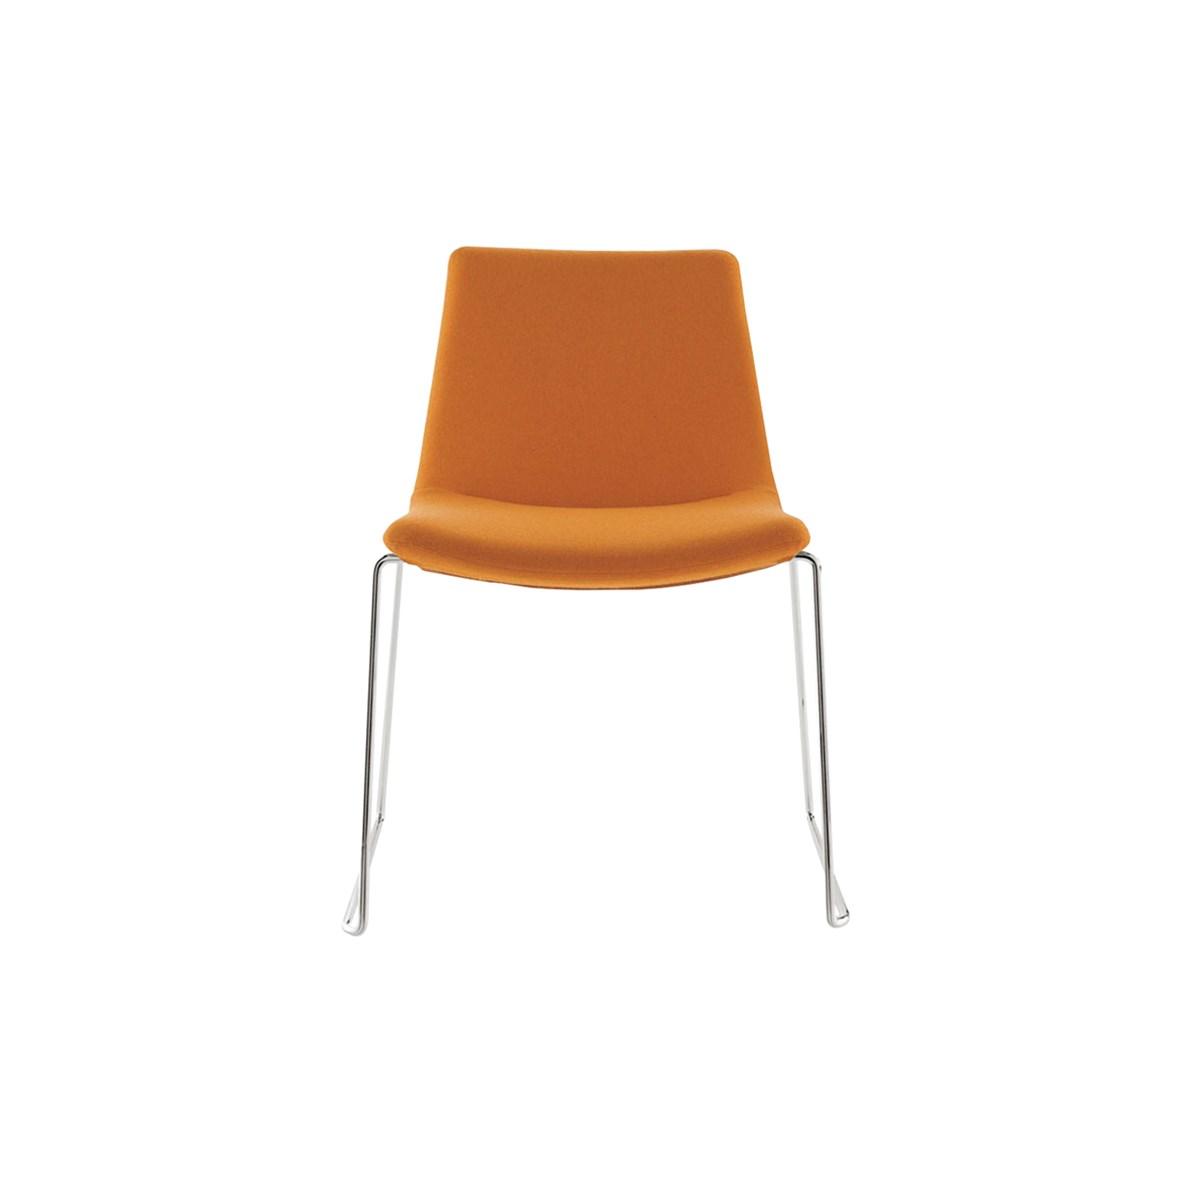 B&B-Italia-Jeffrey-Bernett-Cosmos-Chair-Matisse-2